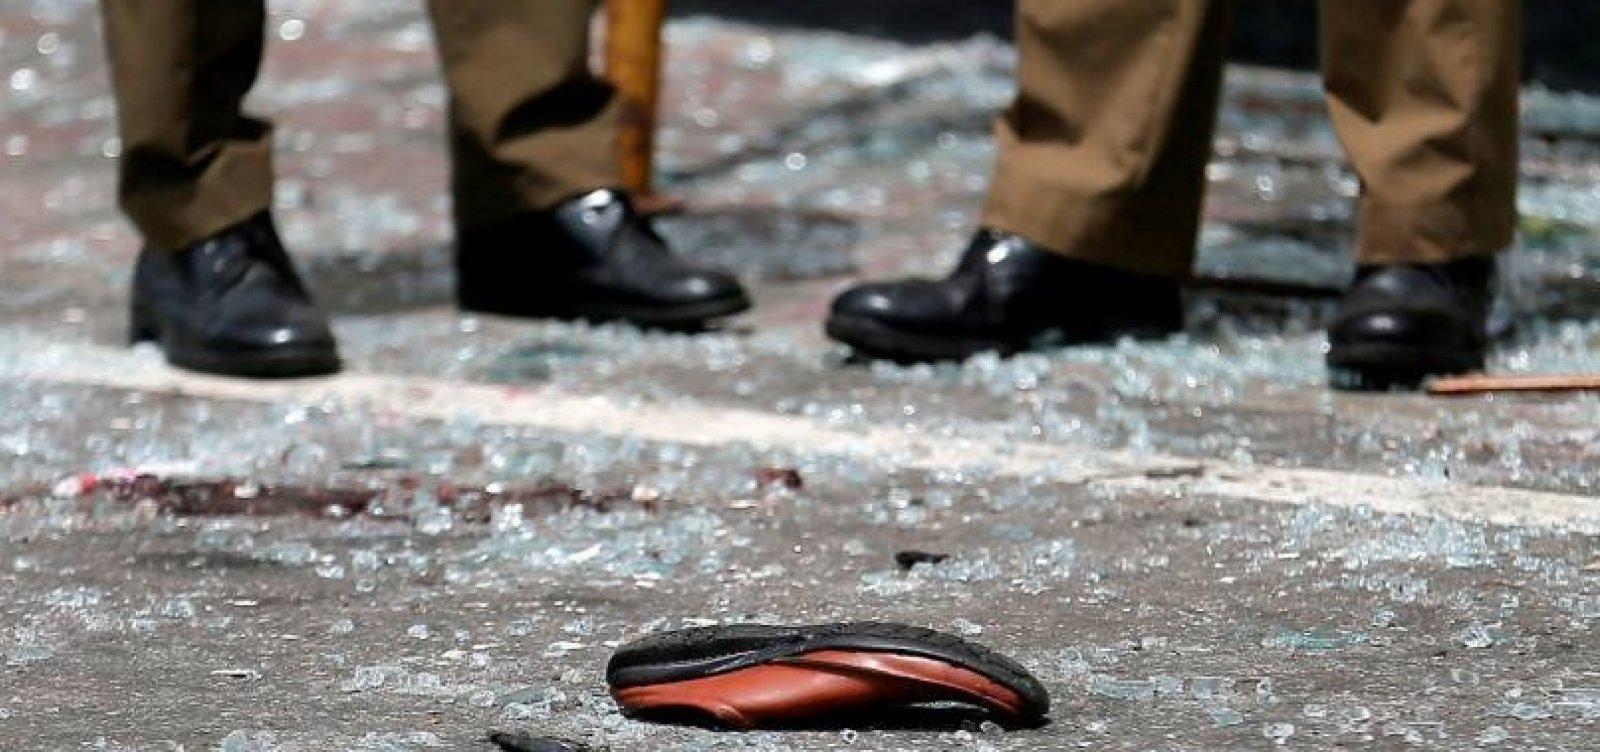 [Número de mortos em ataques no Sri Lanka chega a 290]